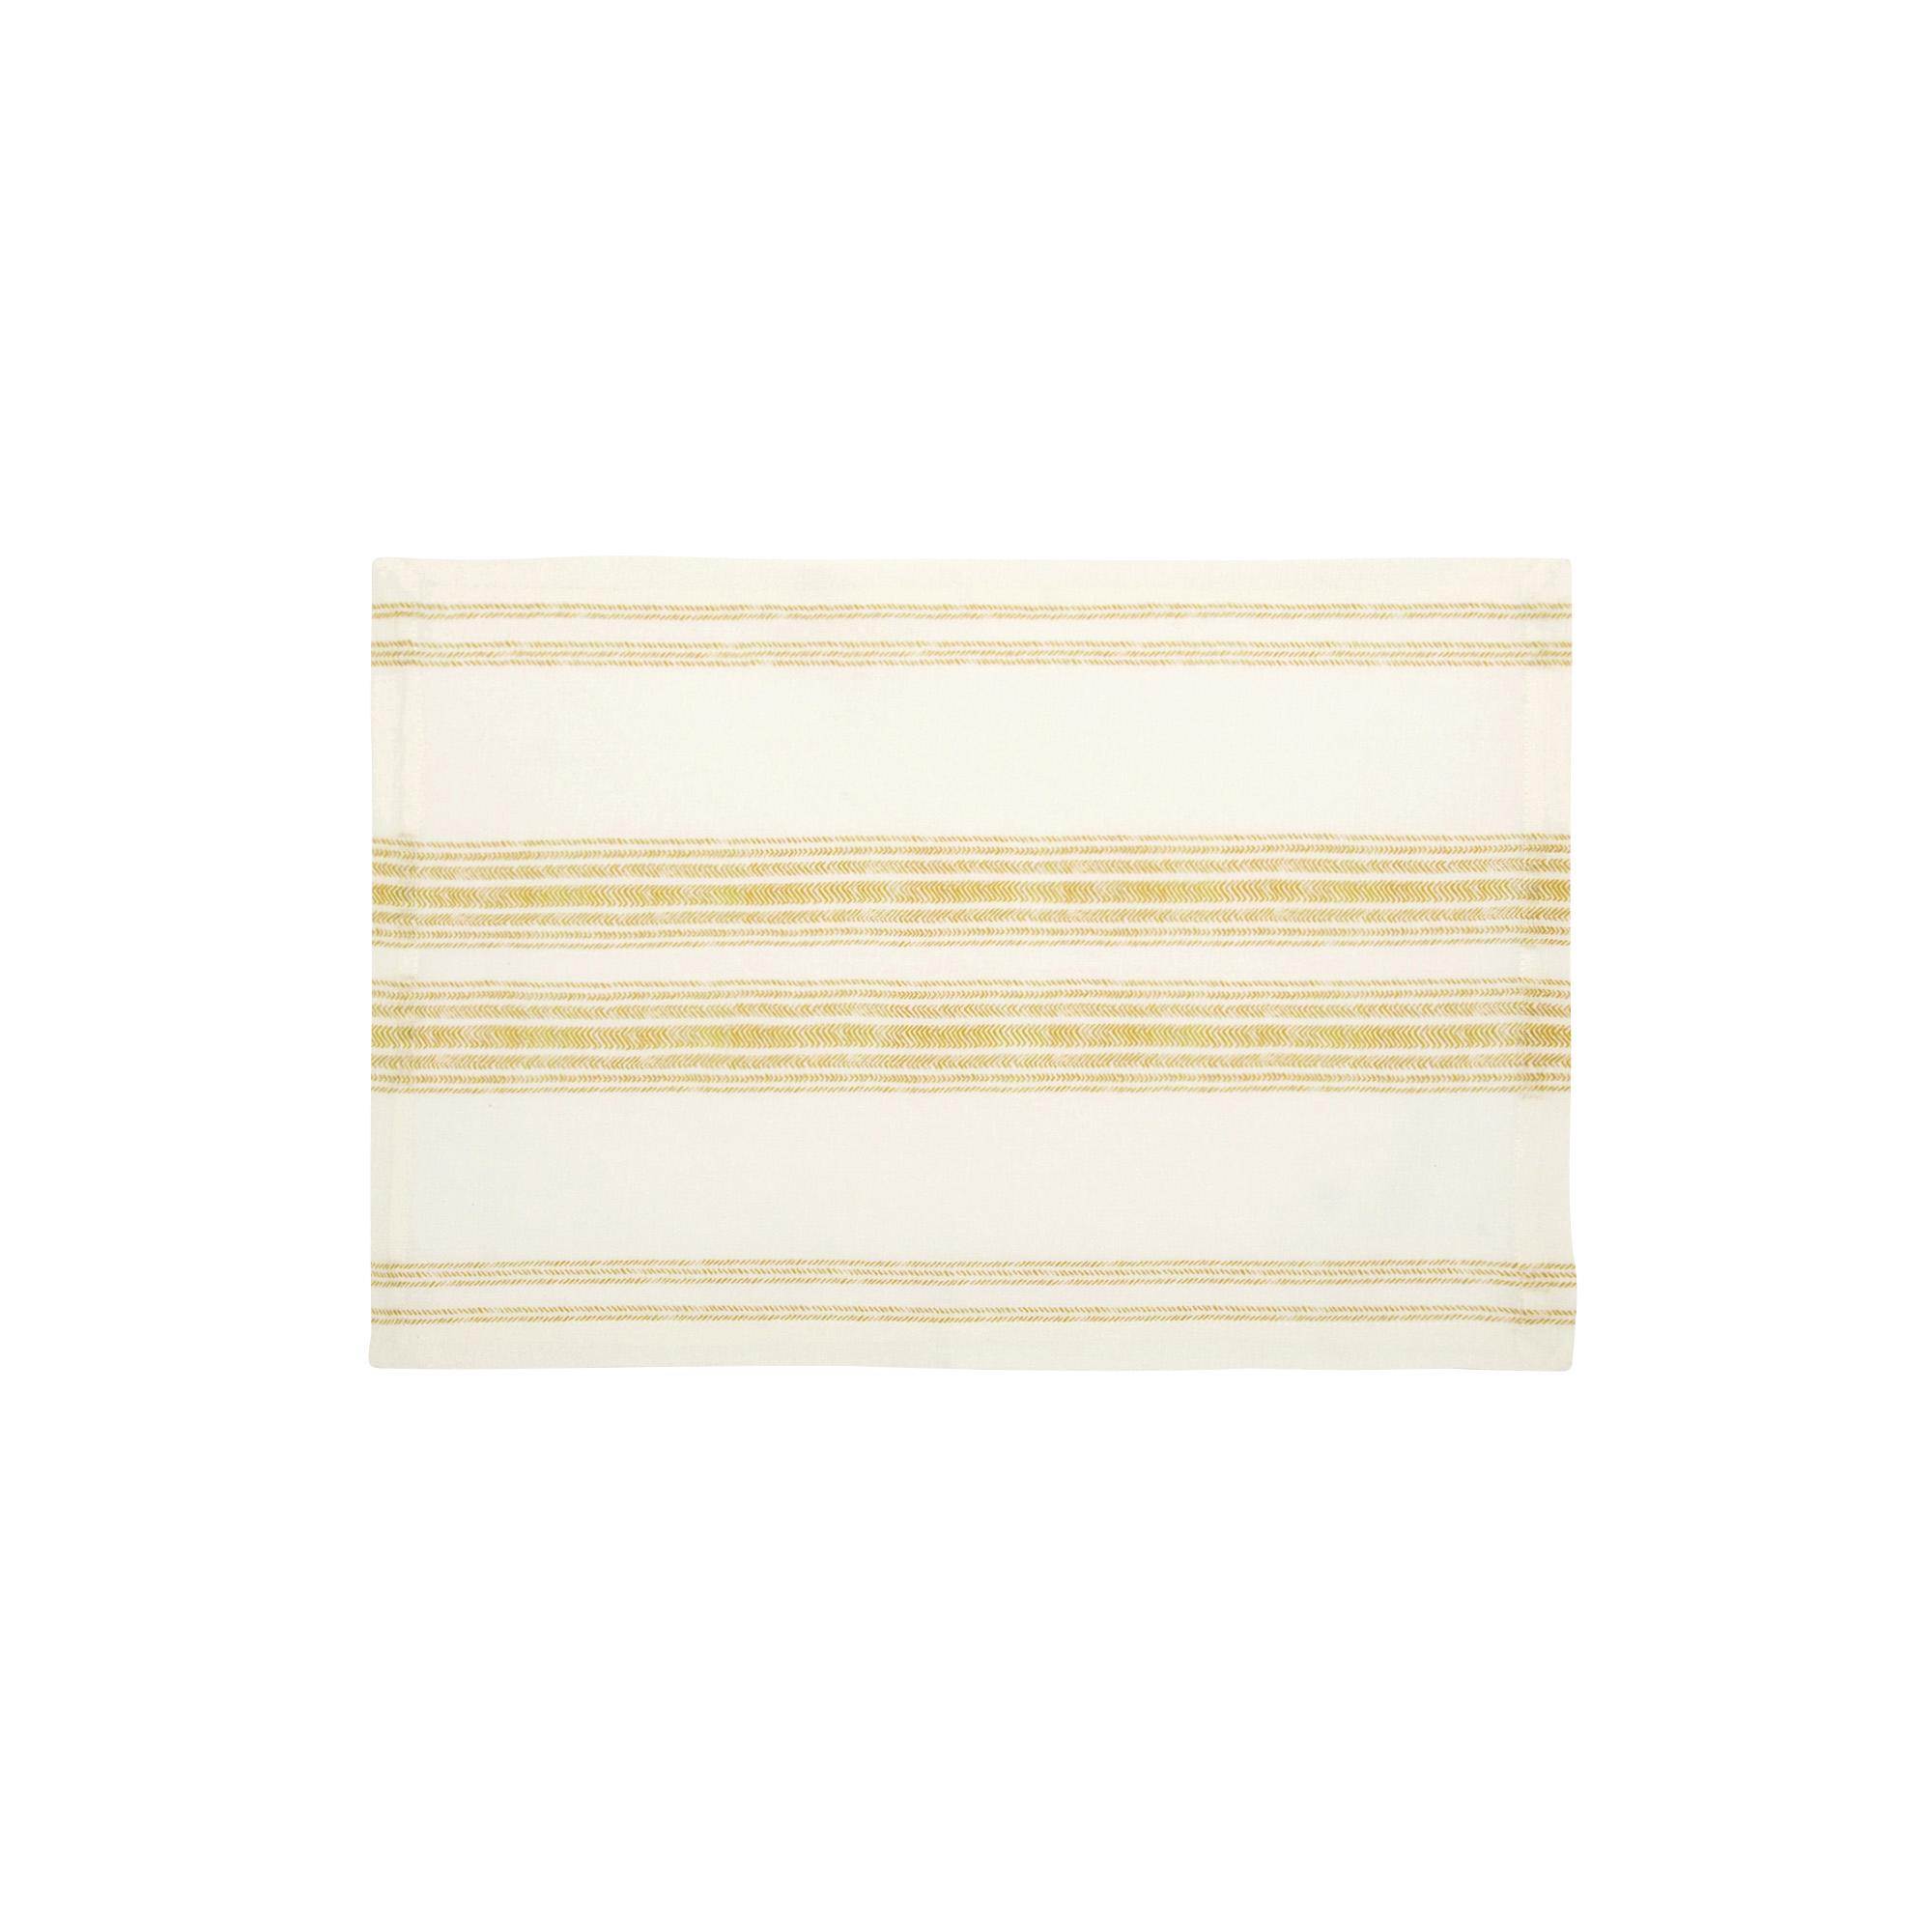 Set de table en lin jaune ocre 37x50